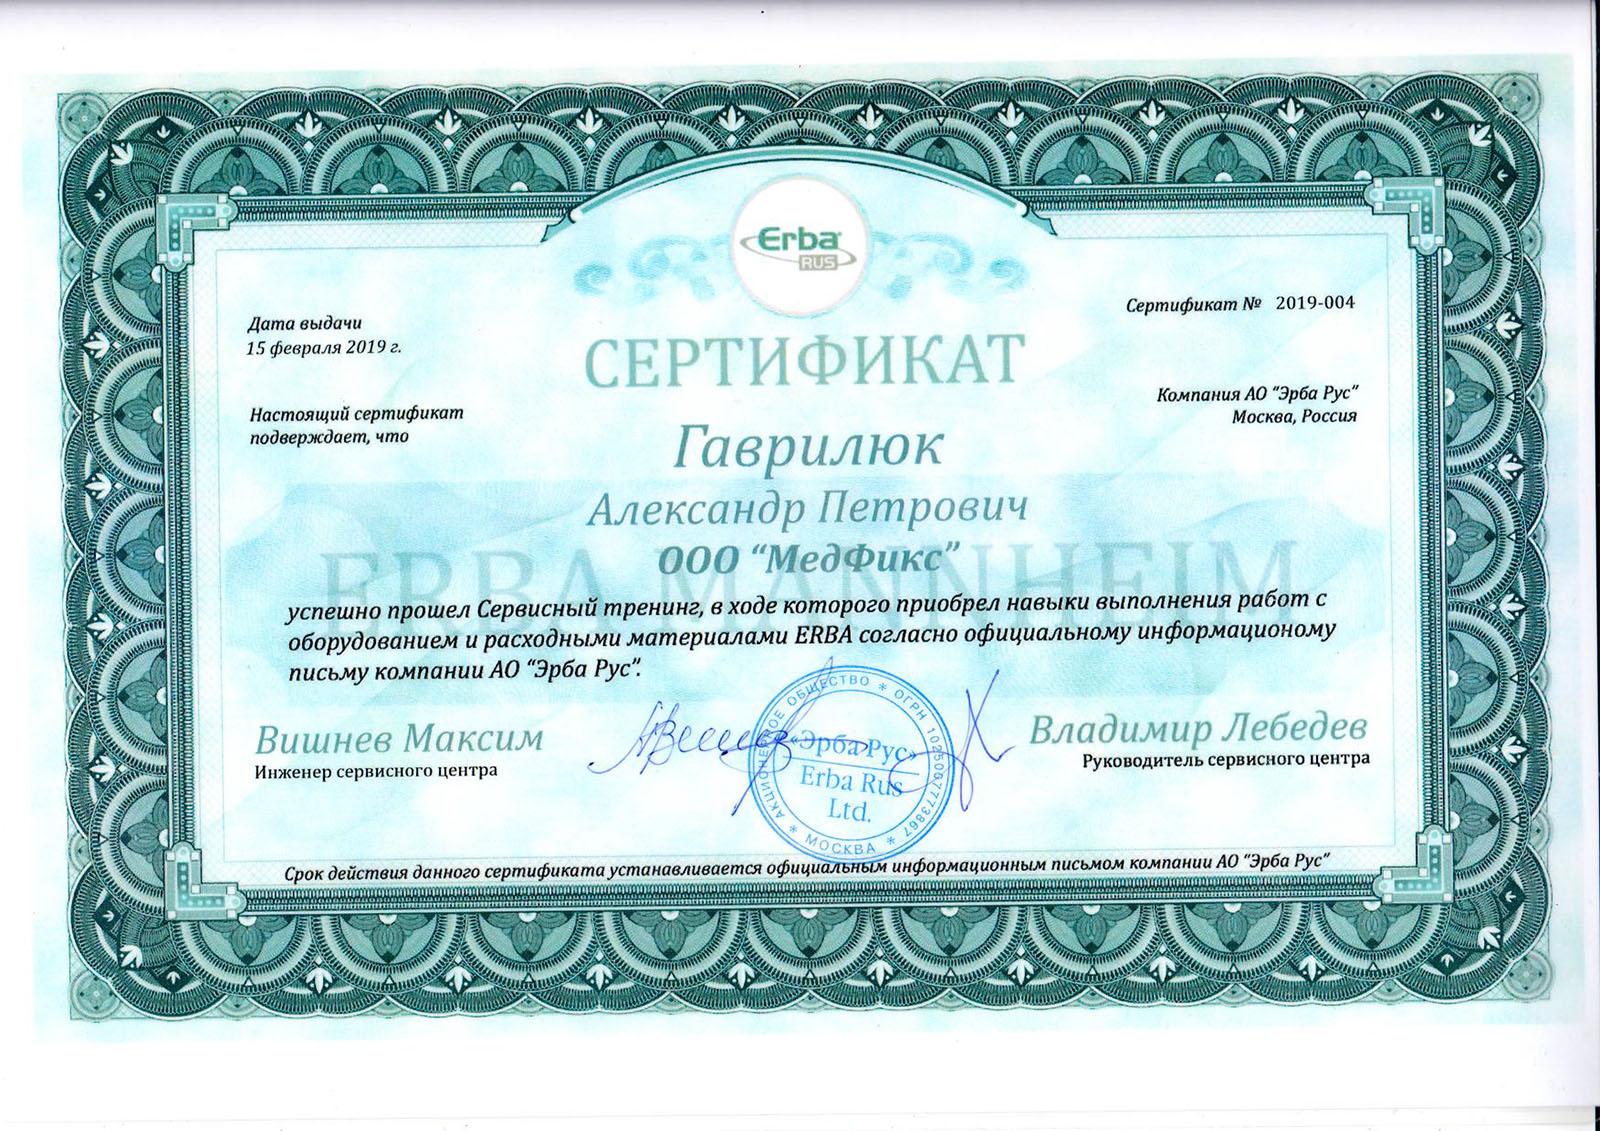 laboratornoe-oborudovanie - Erba-Gavrilyuk-15.02.2019